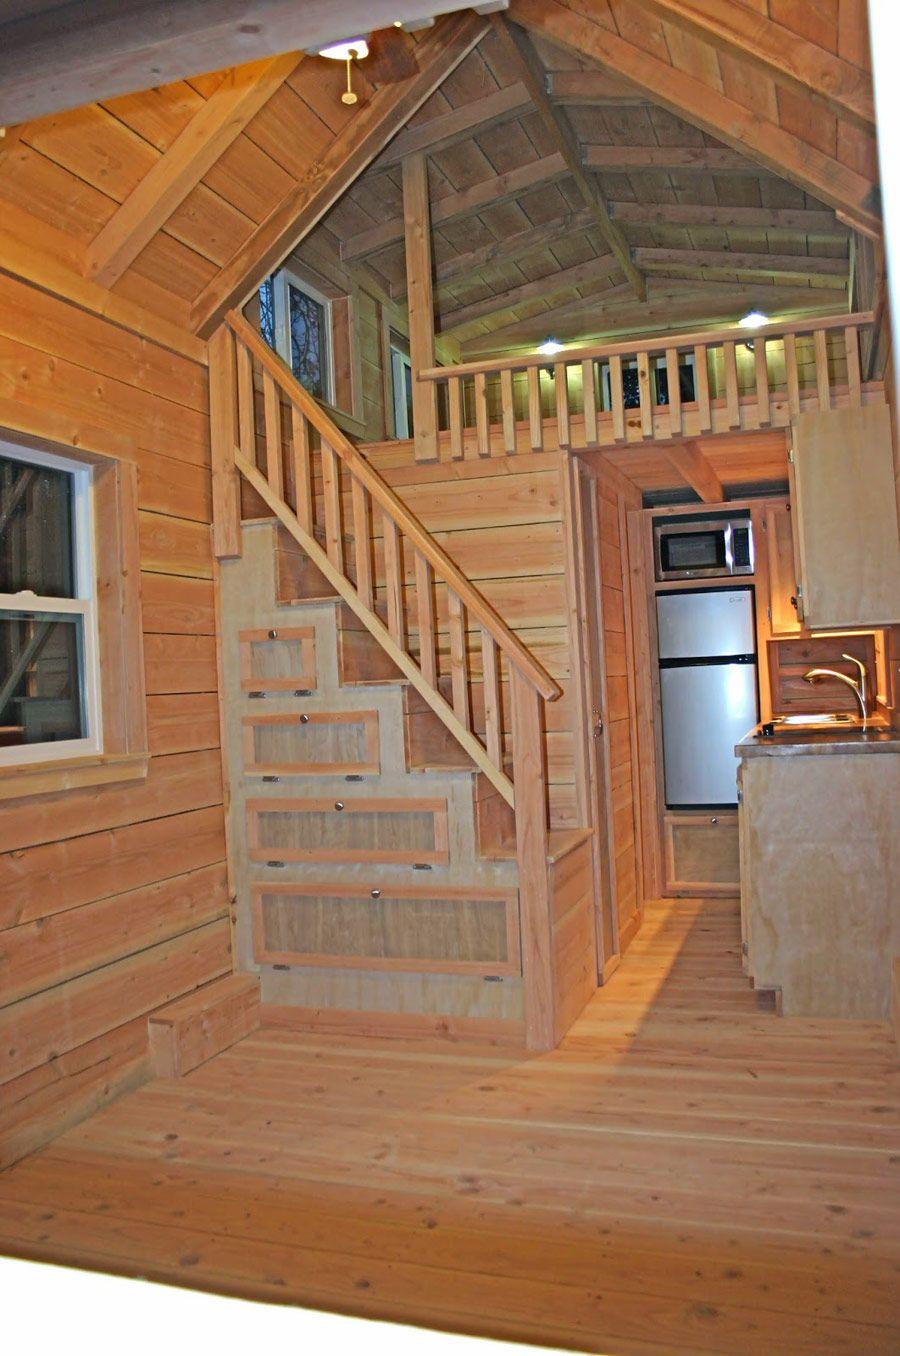 Cape Cod Tiny House Tiny House Loft Tiny House Cabin